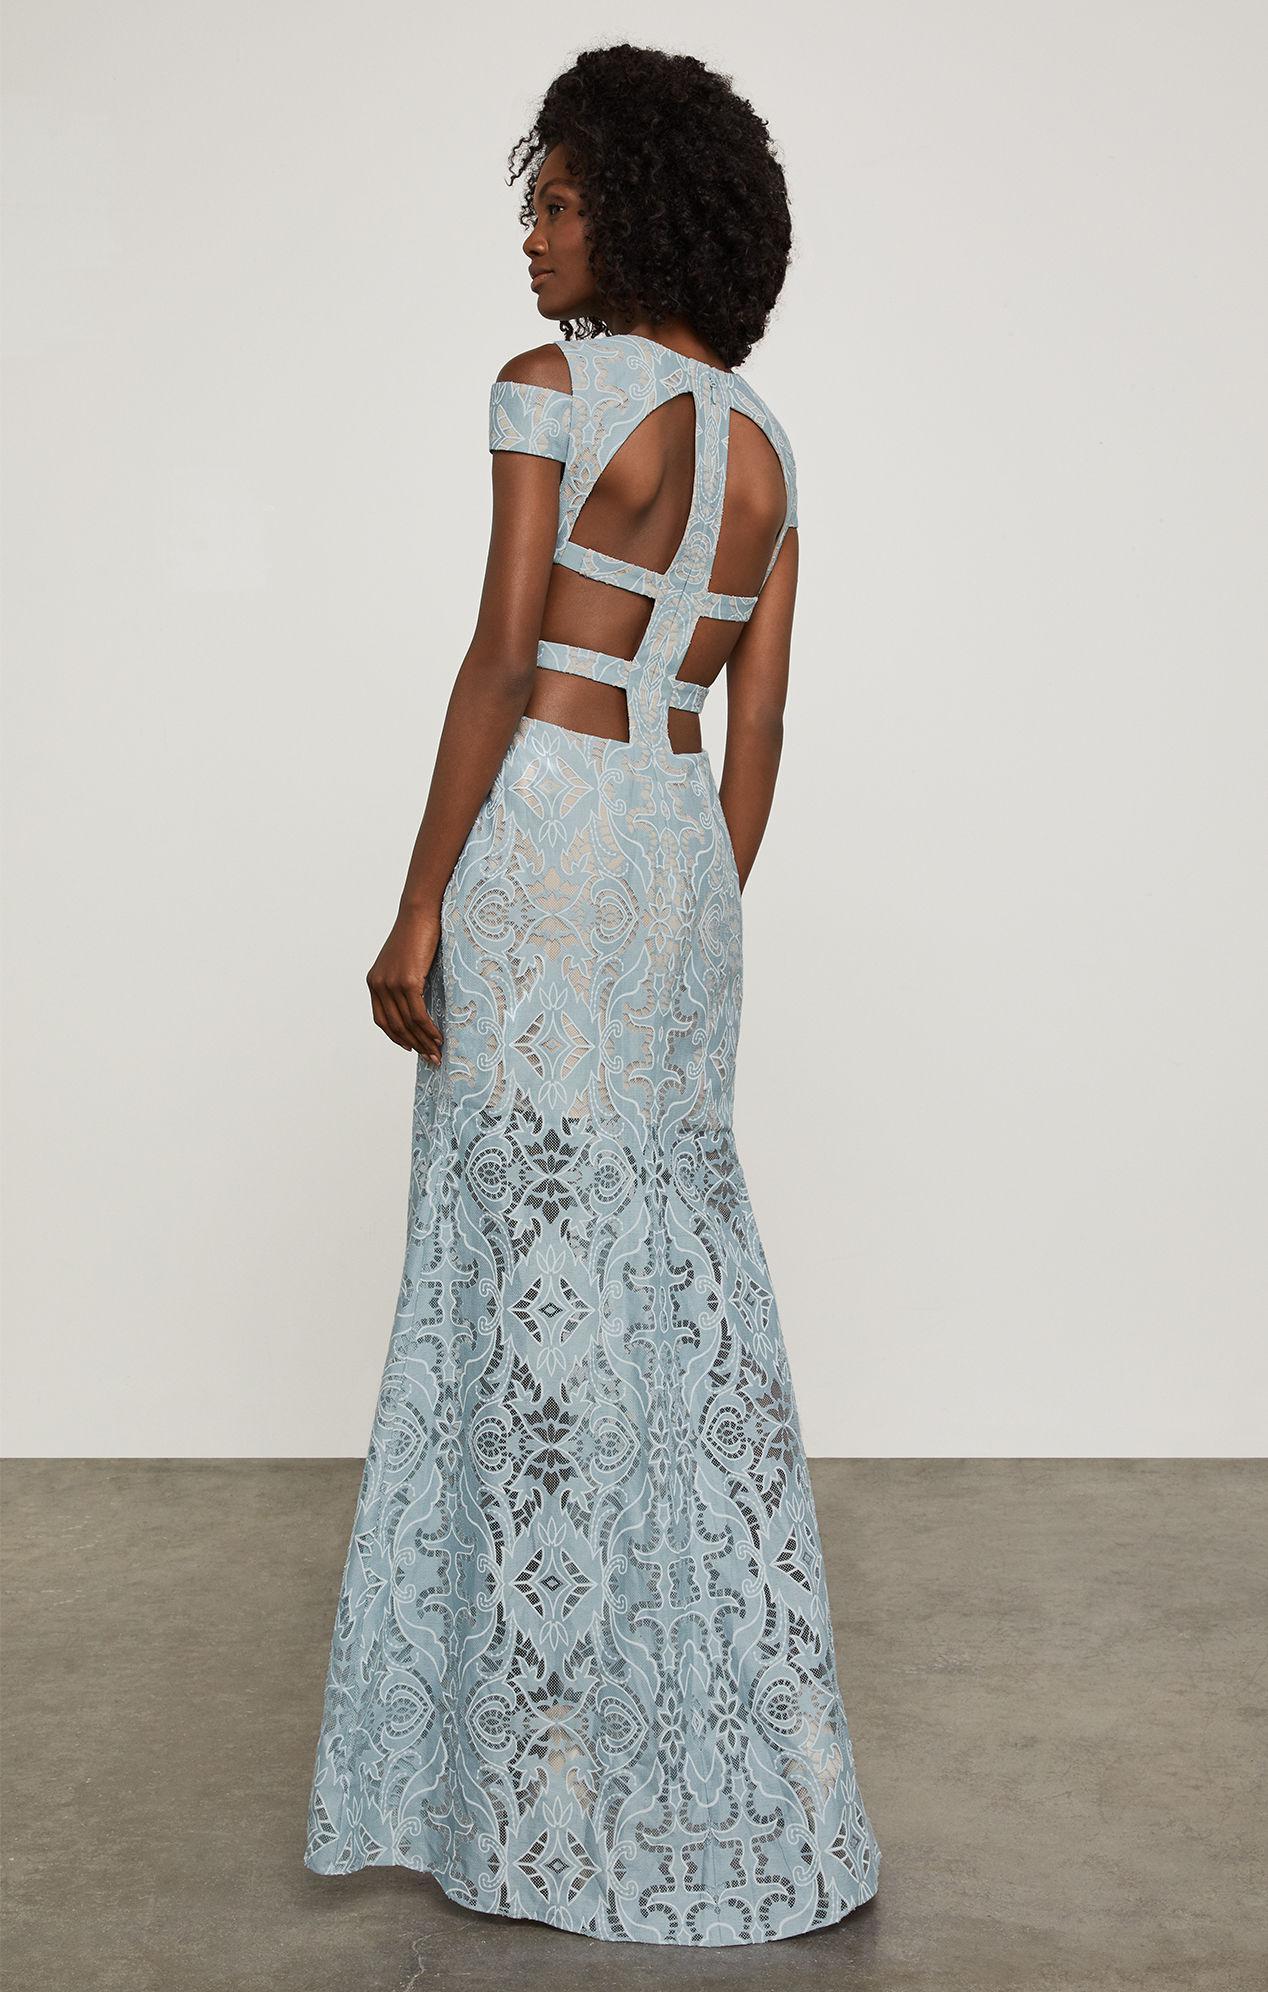 Lyst - Bcbgmaxazria Bcbg Ava Cutout Lace Gown in Blue